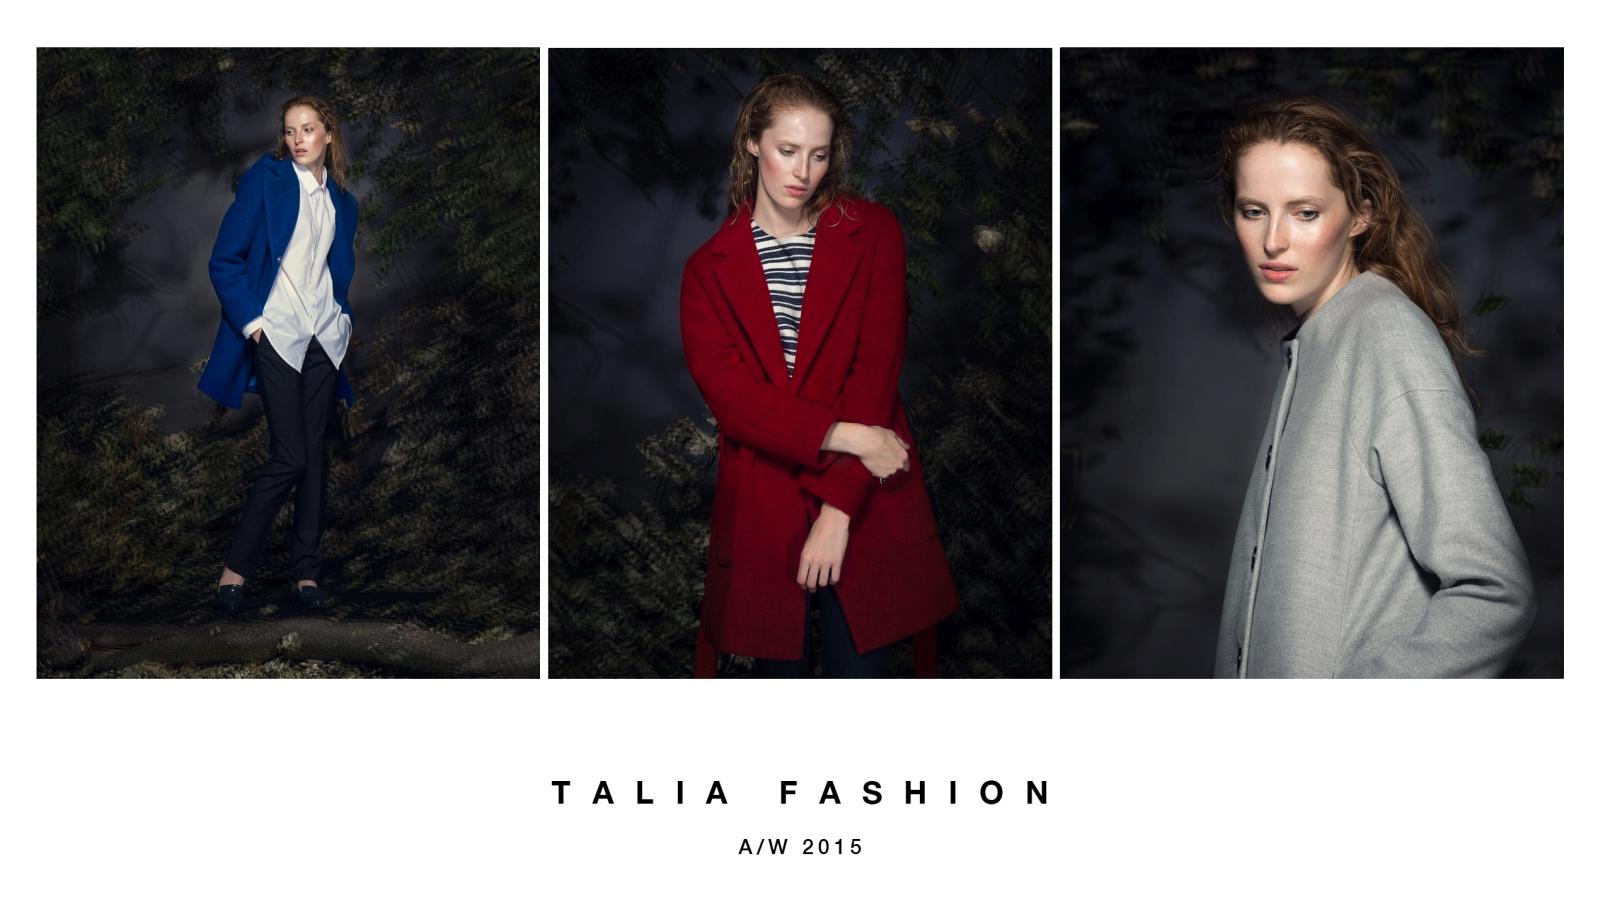 talia campaign 3